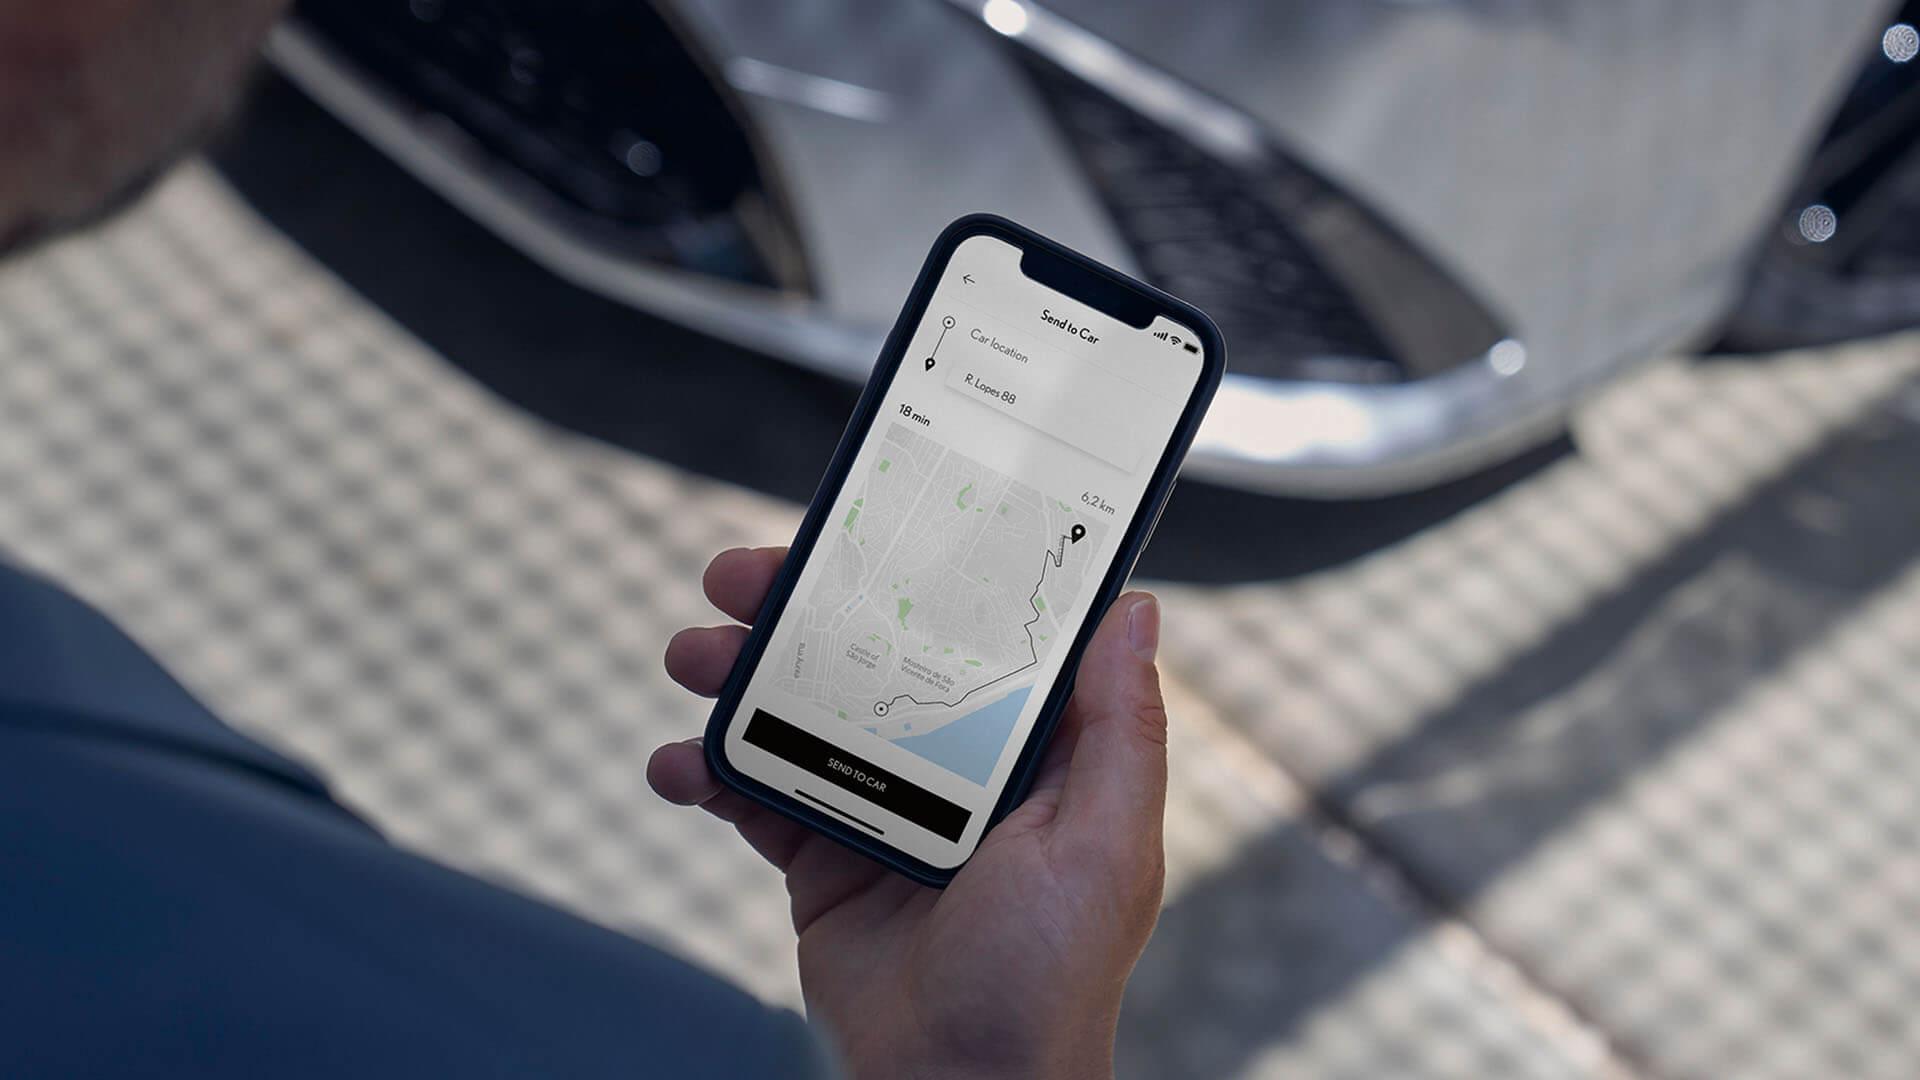 2022 RU lexus es experience interior front new lexus link connected services